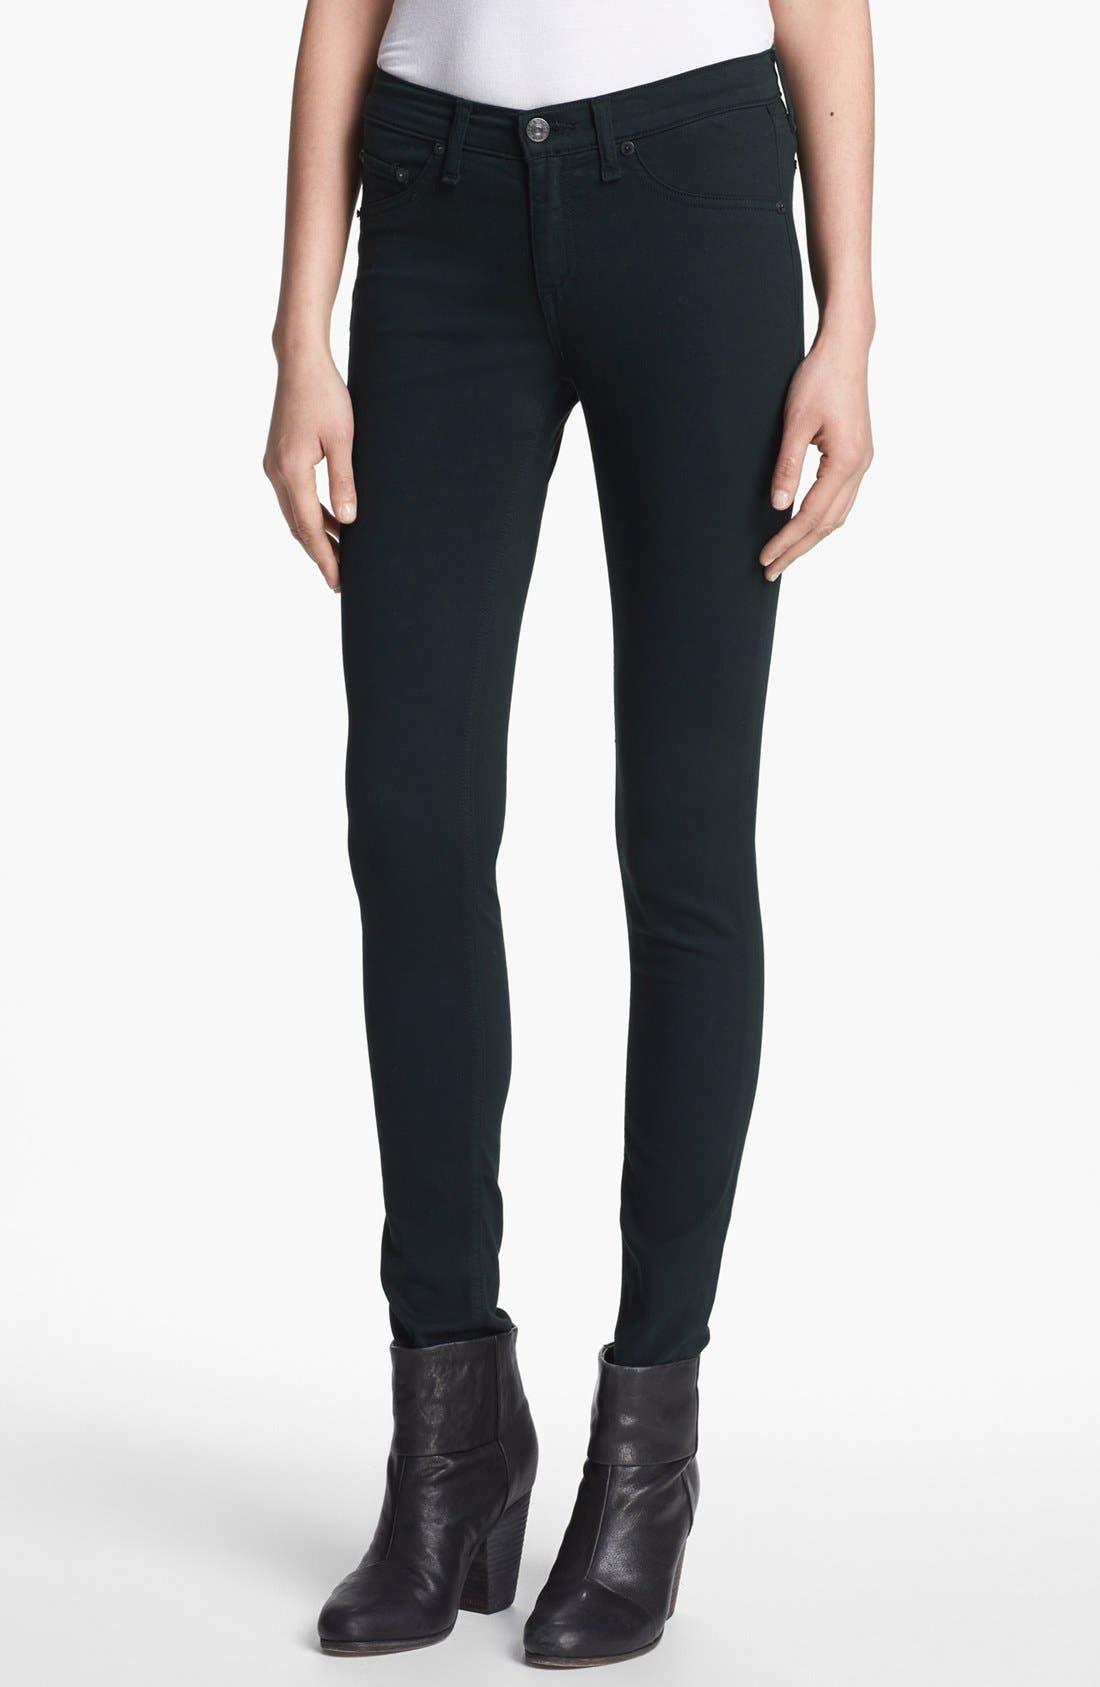 Alternate Image 1 Selected - rag & bone/JEAN Plush Twill Leggings